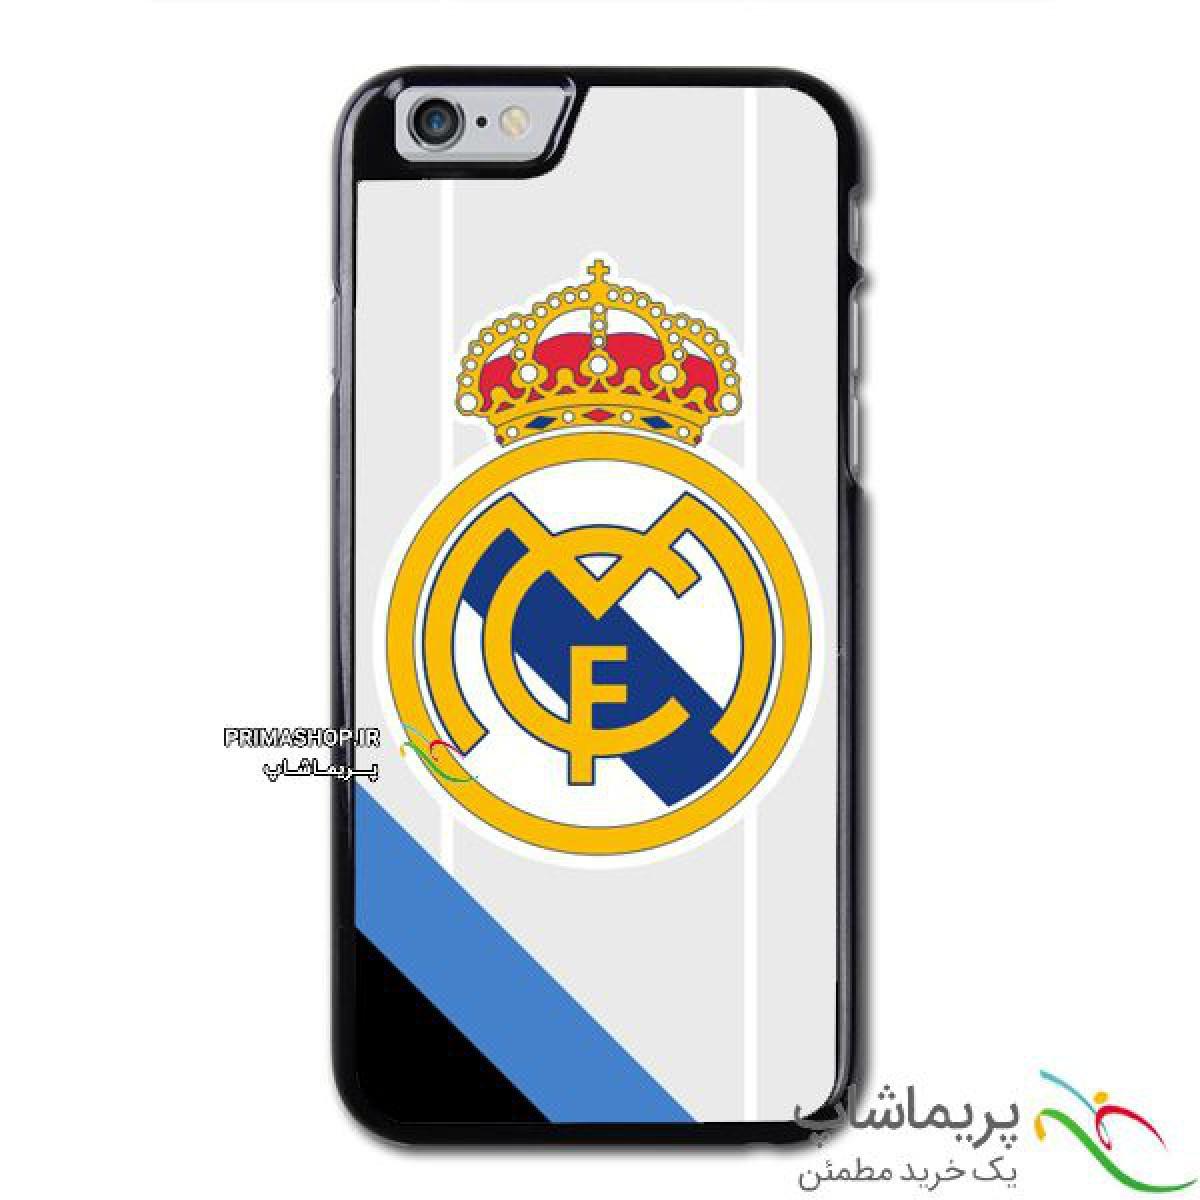 قاب موبایل رئال مادرید جدید 2017 (4)